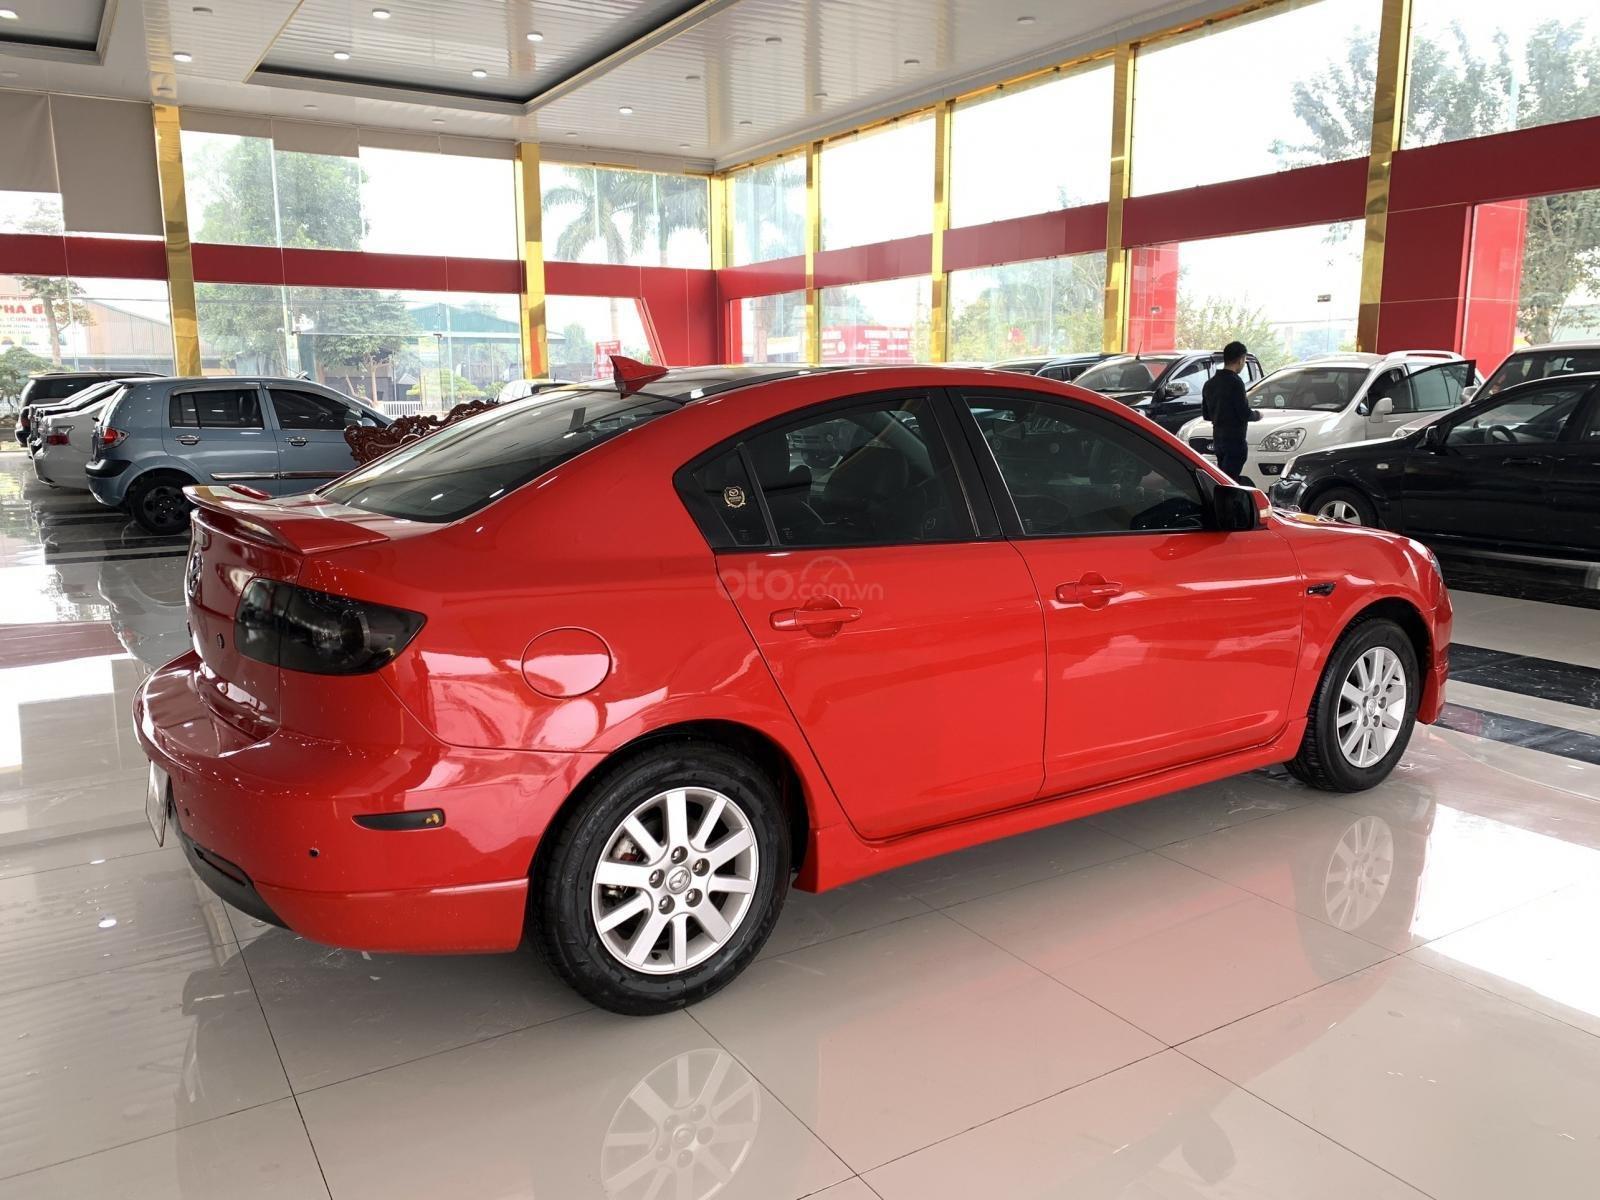 Bán Mazda 3 1.6 AT sản xuất 2009 (6)